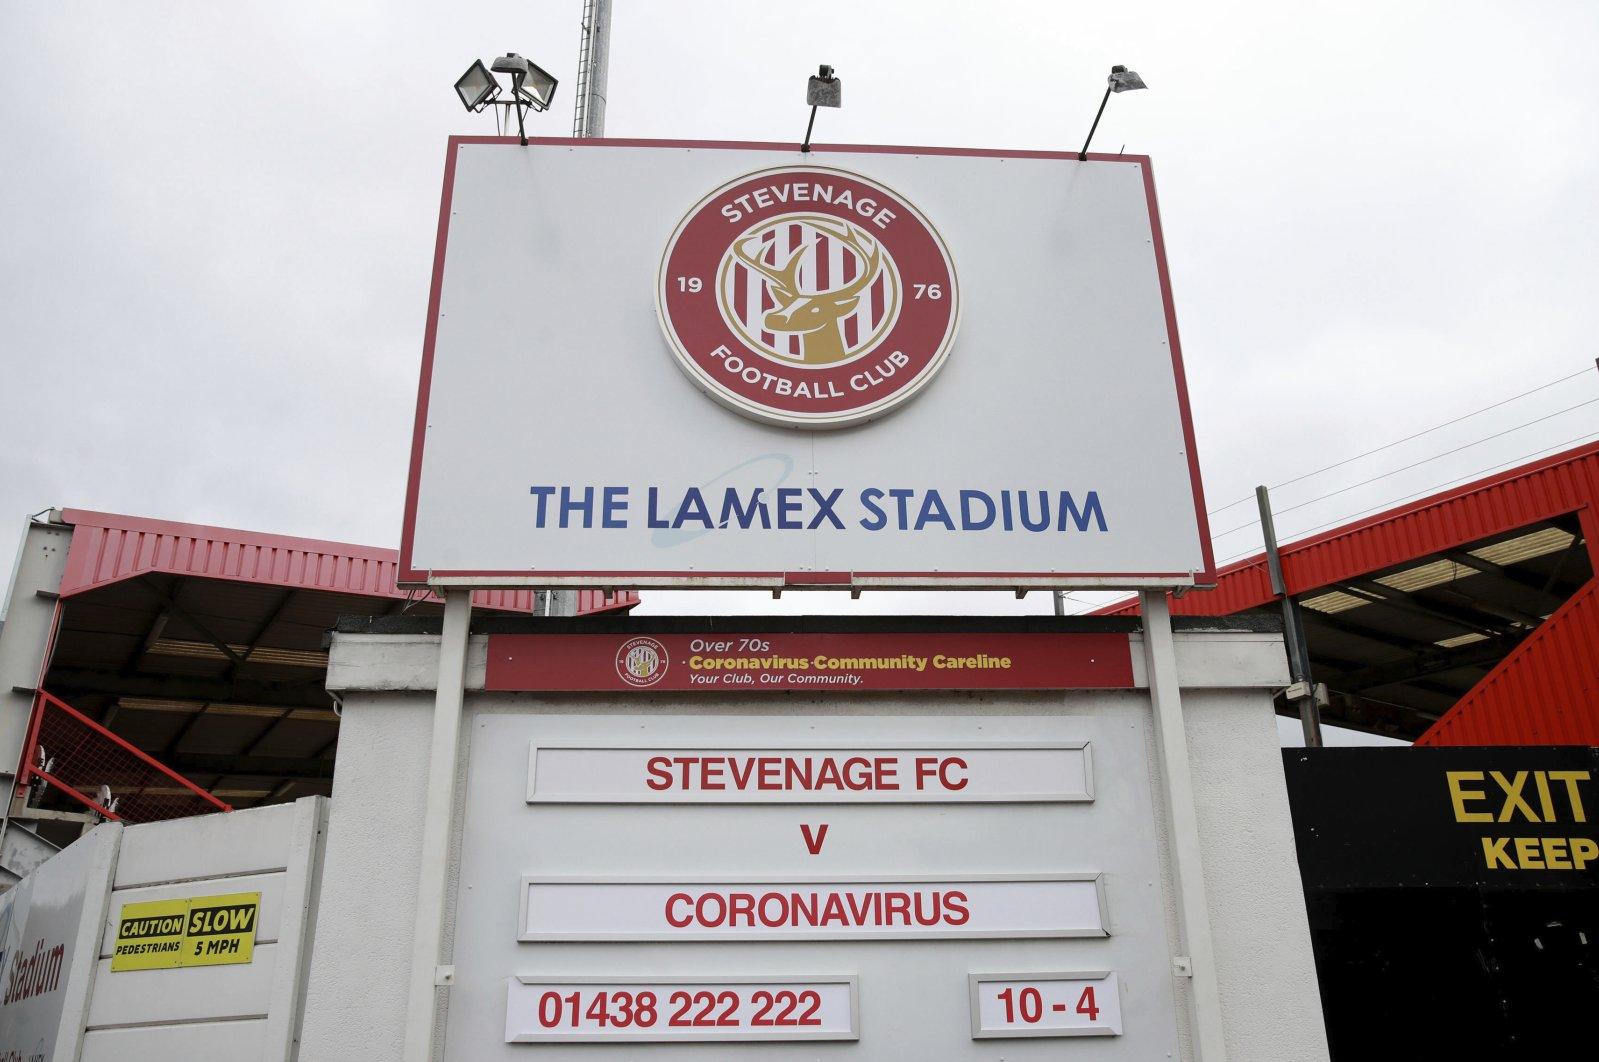 The Lamex Stadium, home of Stevenage football club, where the upcoming fixture board shows Stevenage FC v Coronavirus, Sunday, March 29, 2020. (AP Photo)